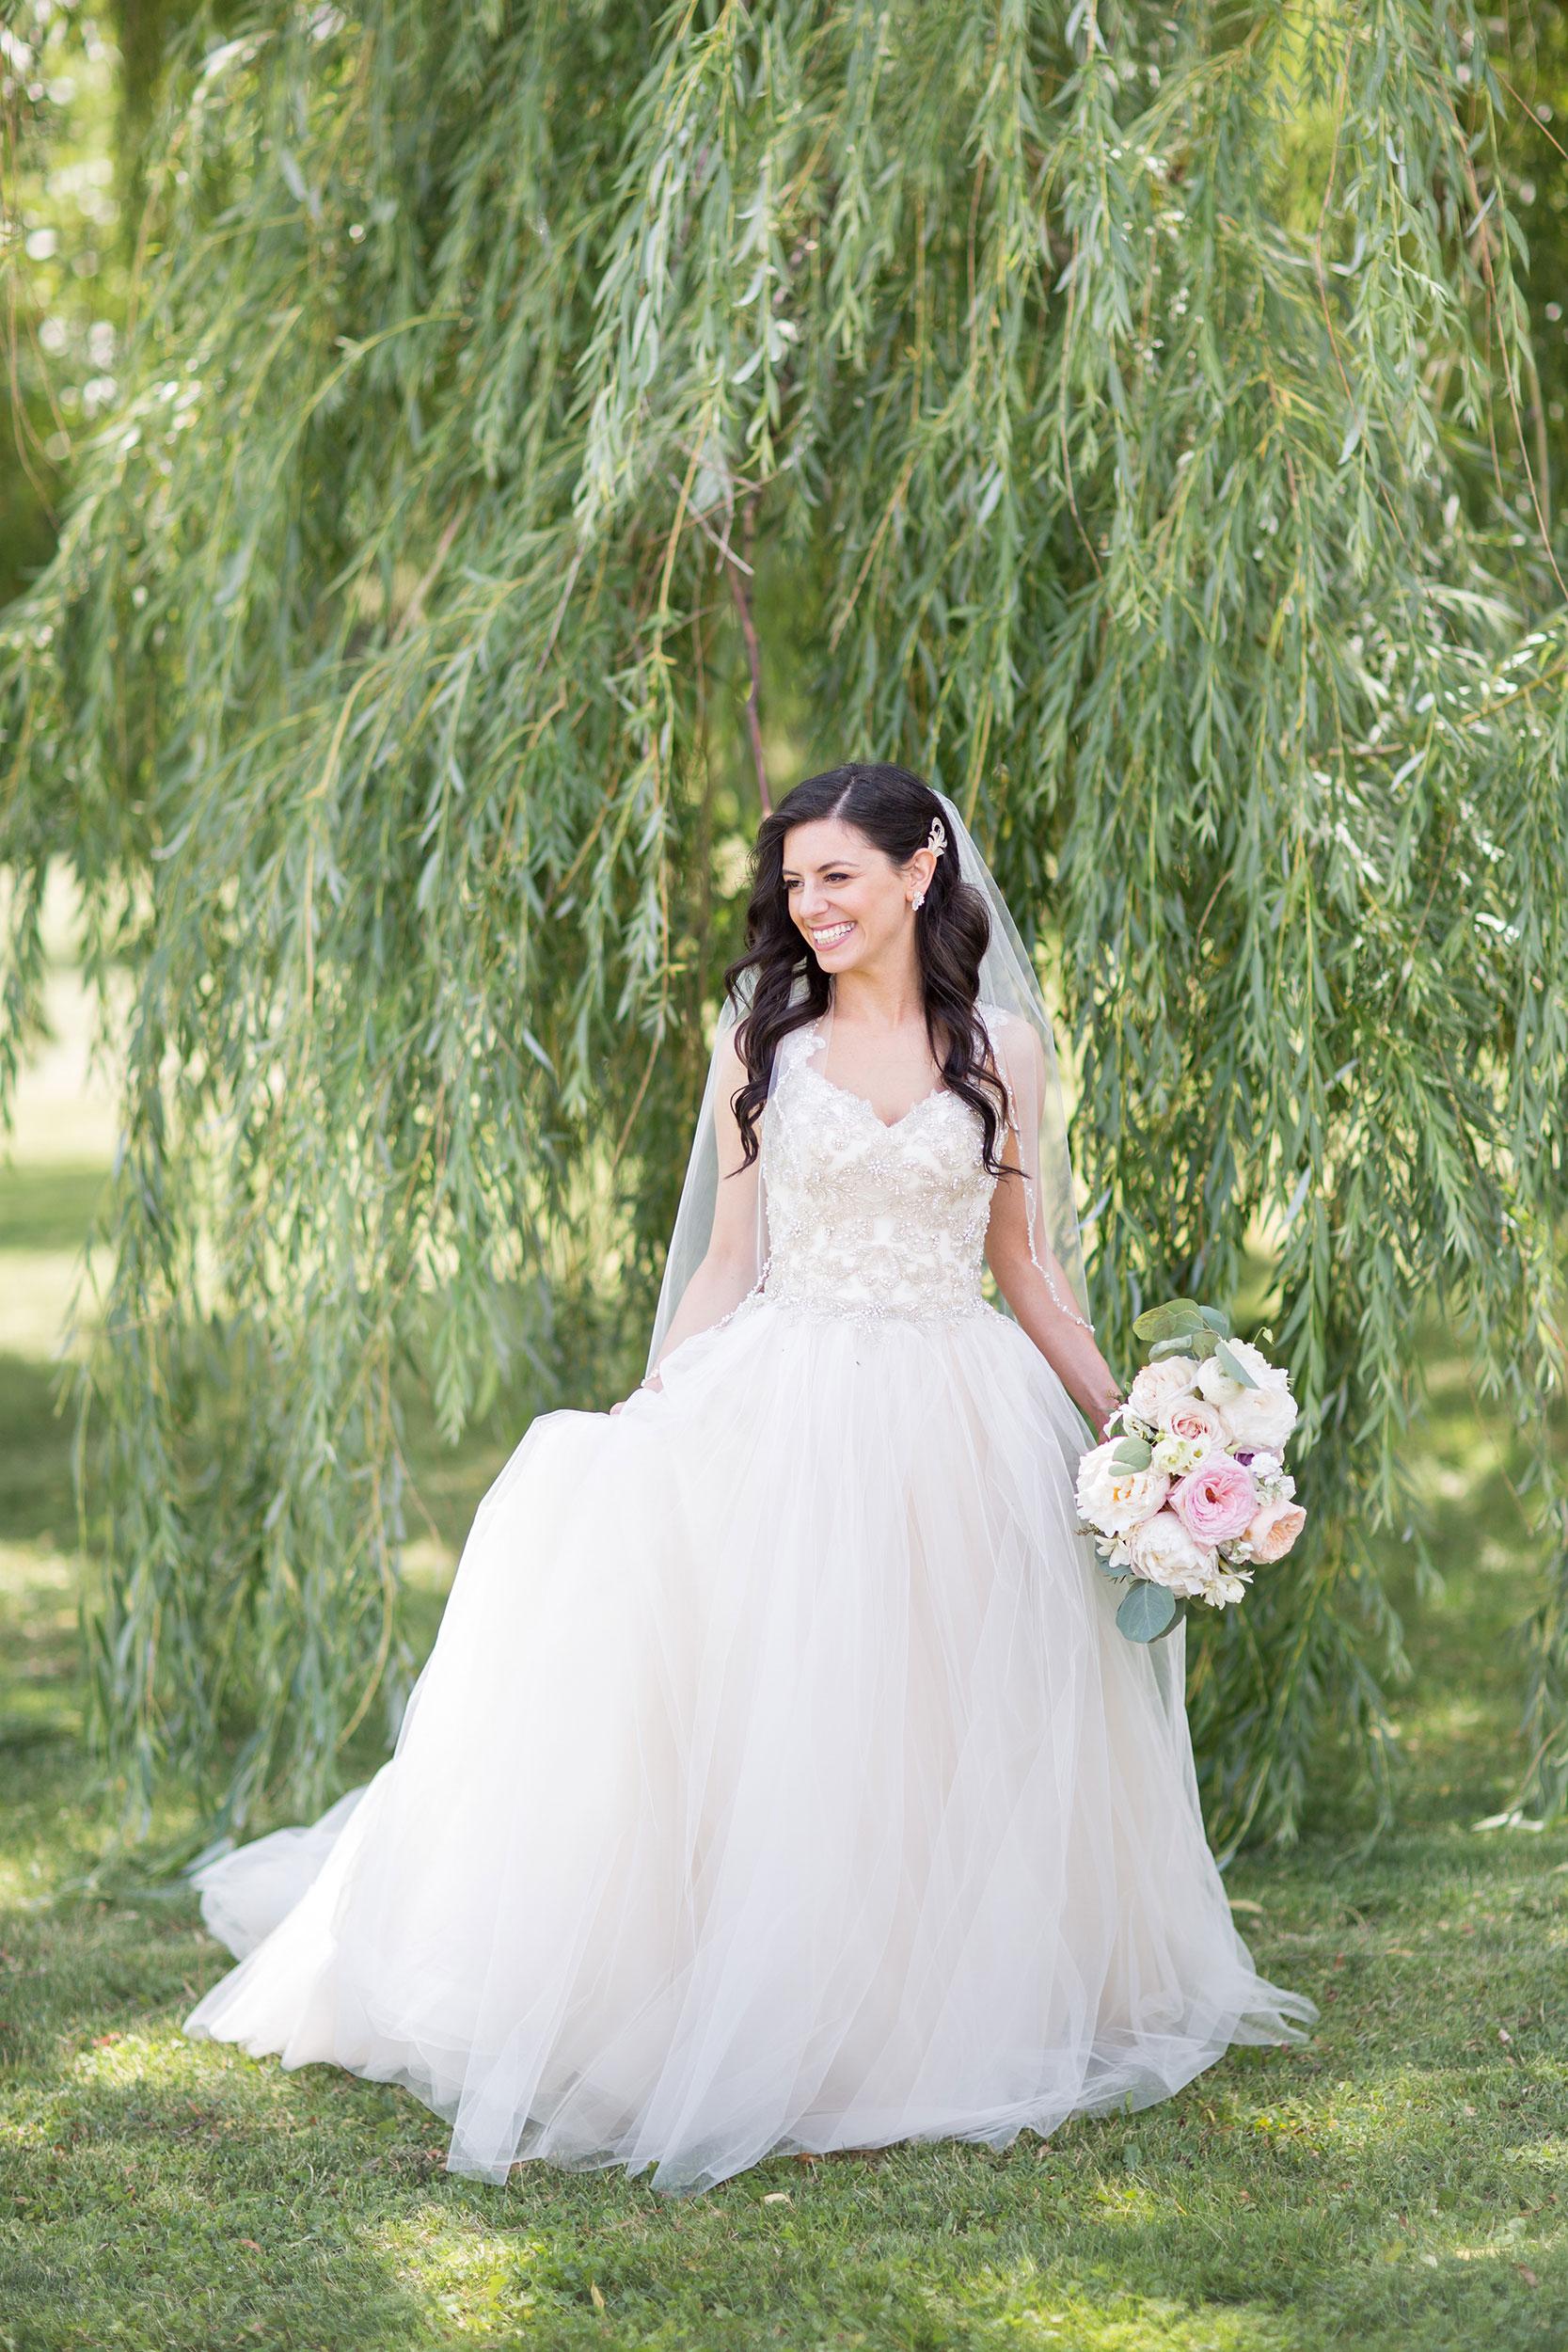 stylish-wedding-photography-windsor-toronto-ontario-wedding-photographer-sprucewood-winery-eryn-shea-photography-40.JPG